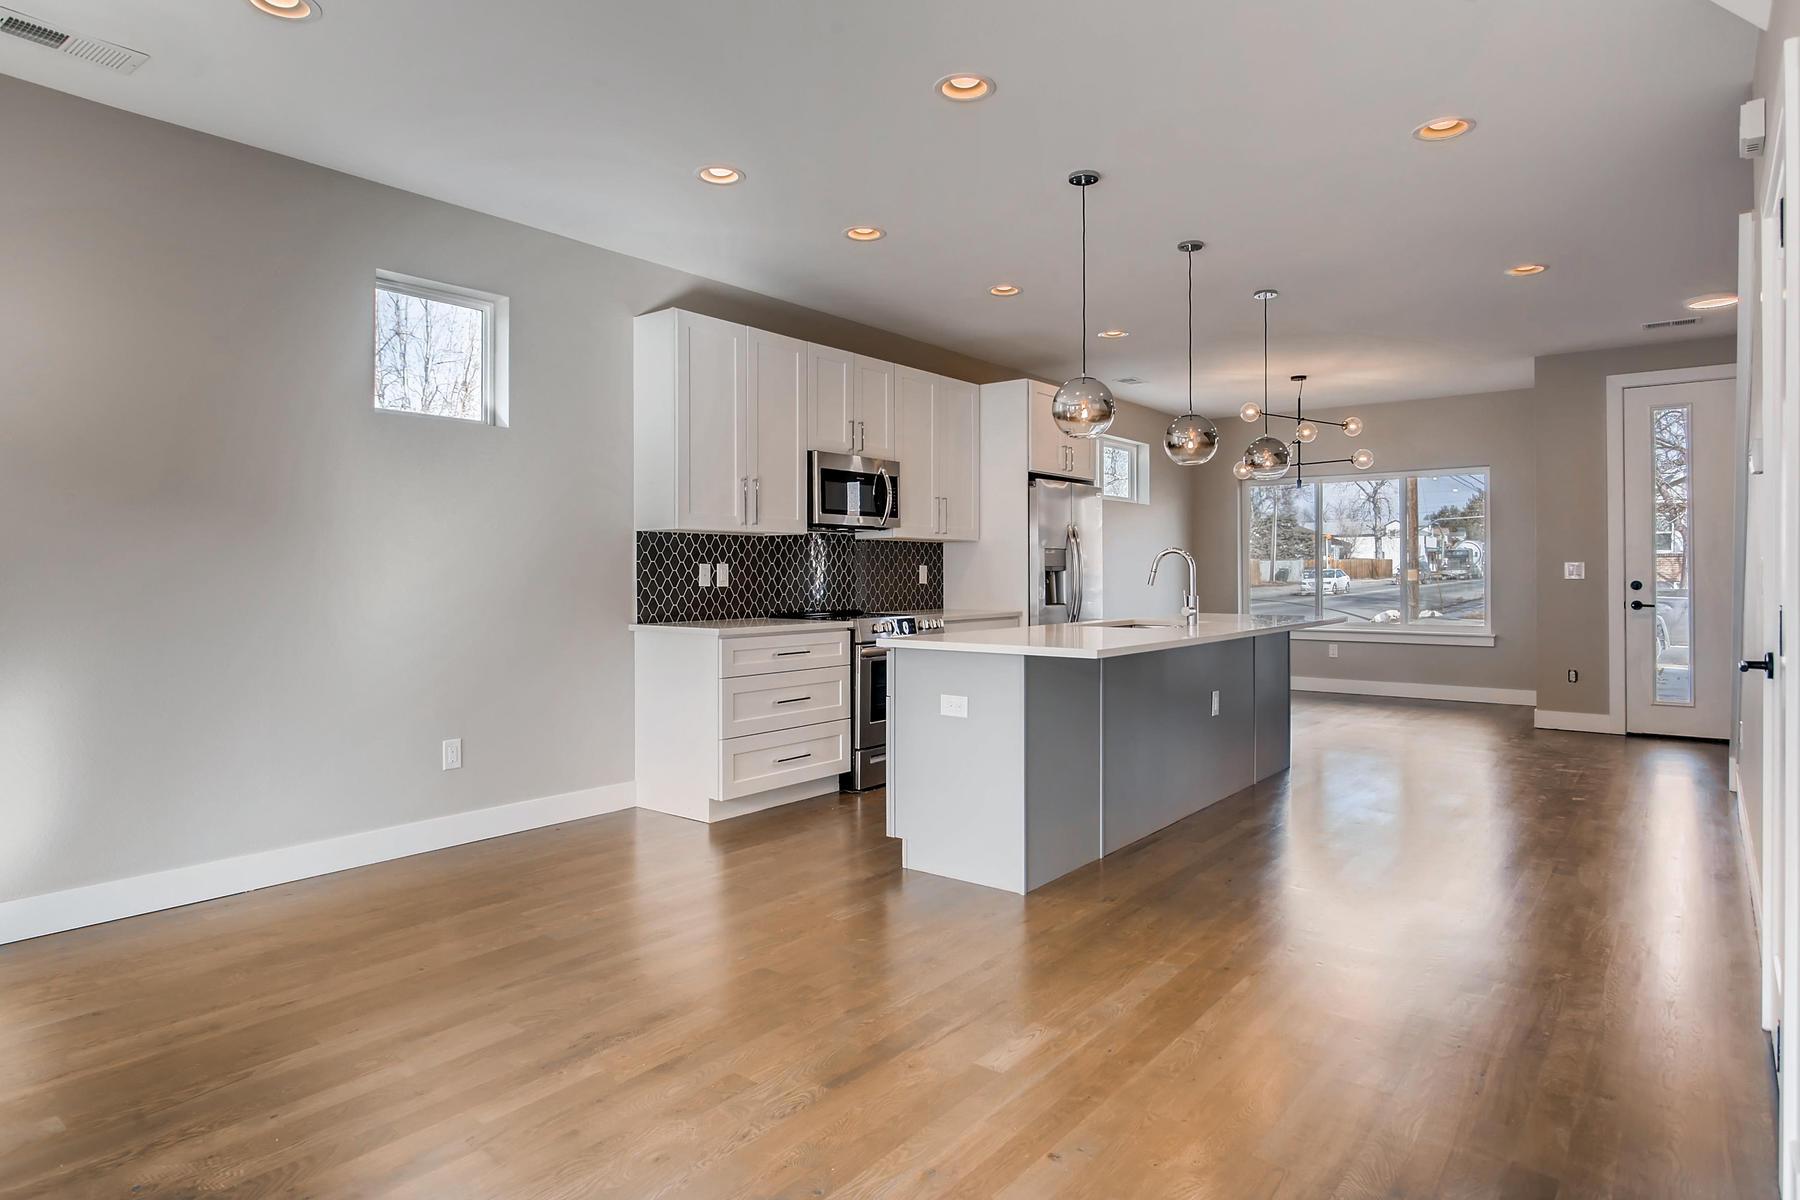 3101 S Cherokee St Englewood-006-6-Kitchen-MLS_Size.jpg